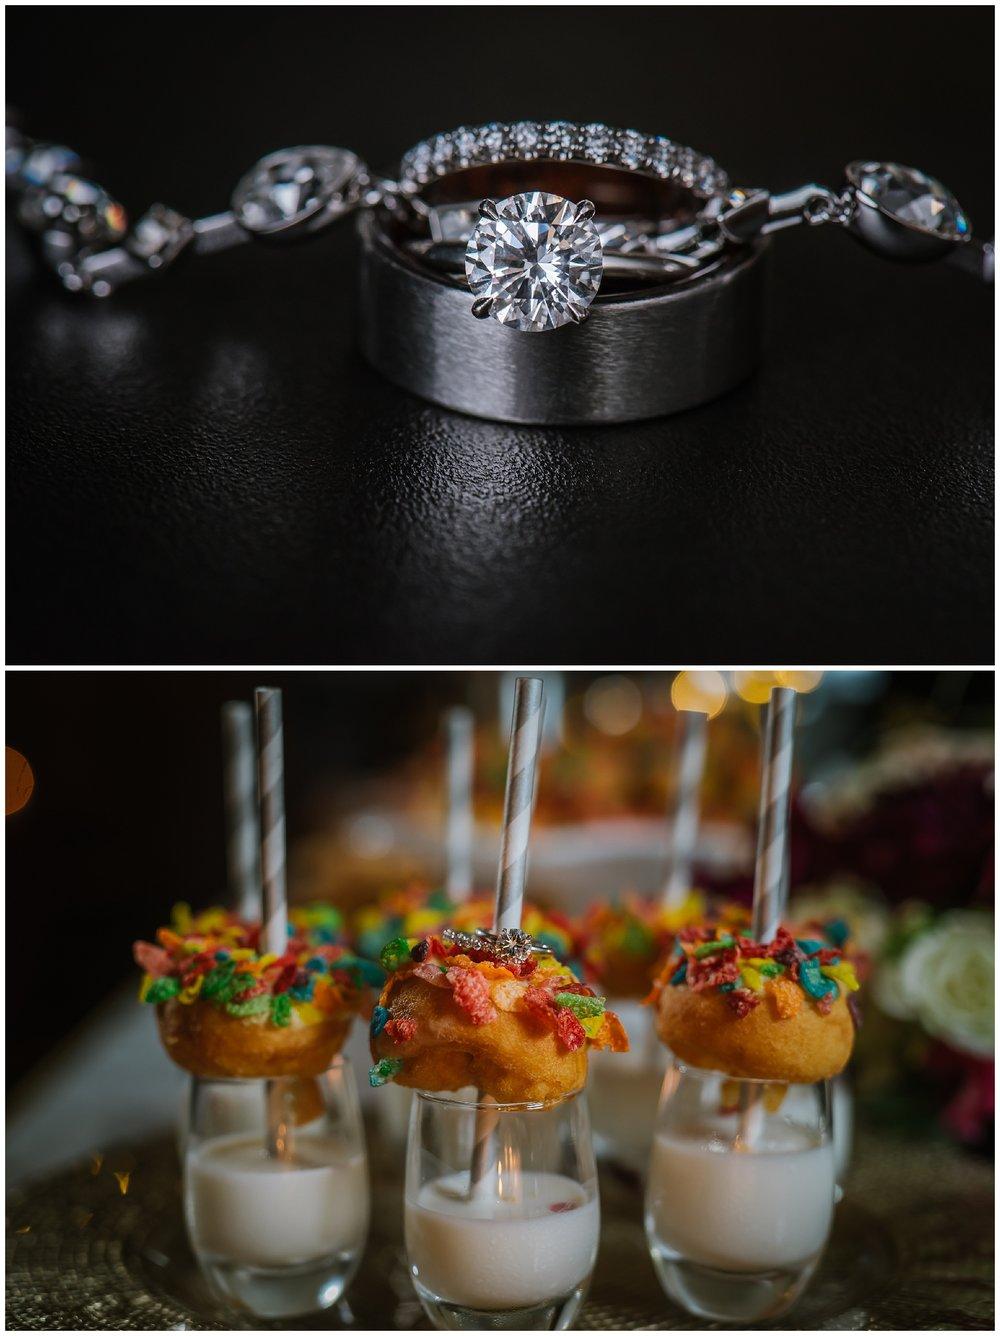 Ashlee-hamon-photography-year-in-review-2016-travel-wanderlust-vsco-adventure-wedding_0058.jpg